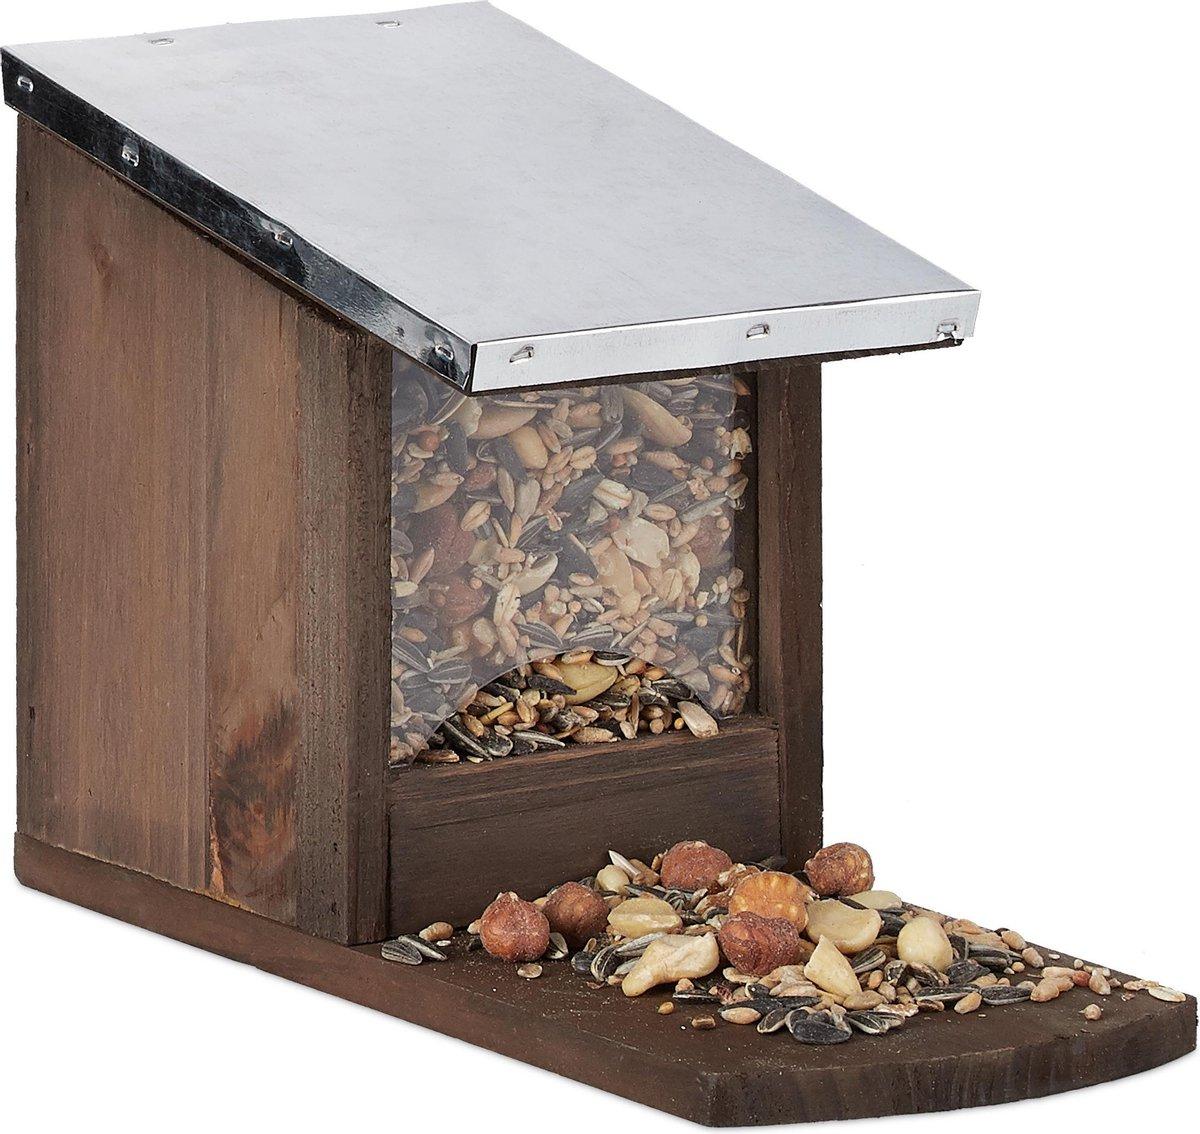 relaxdays eekhoorn voederhuisje - metalen dak - hout - voederhuis - voederkast dark Brown